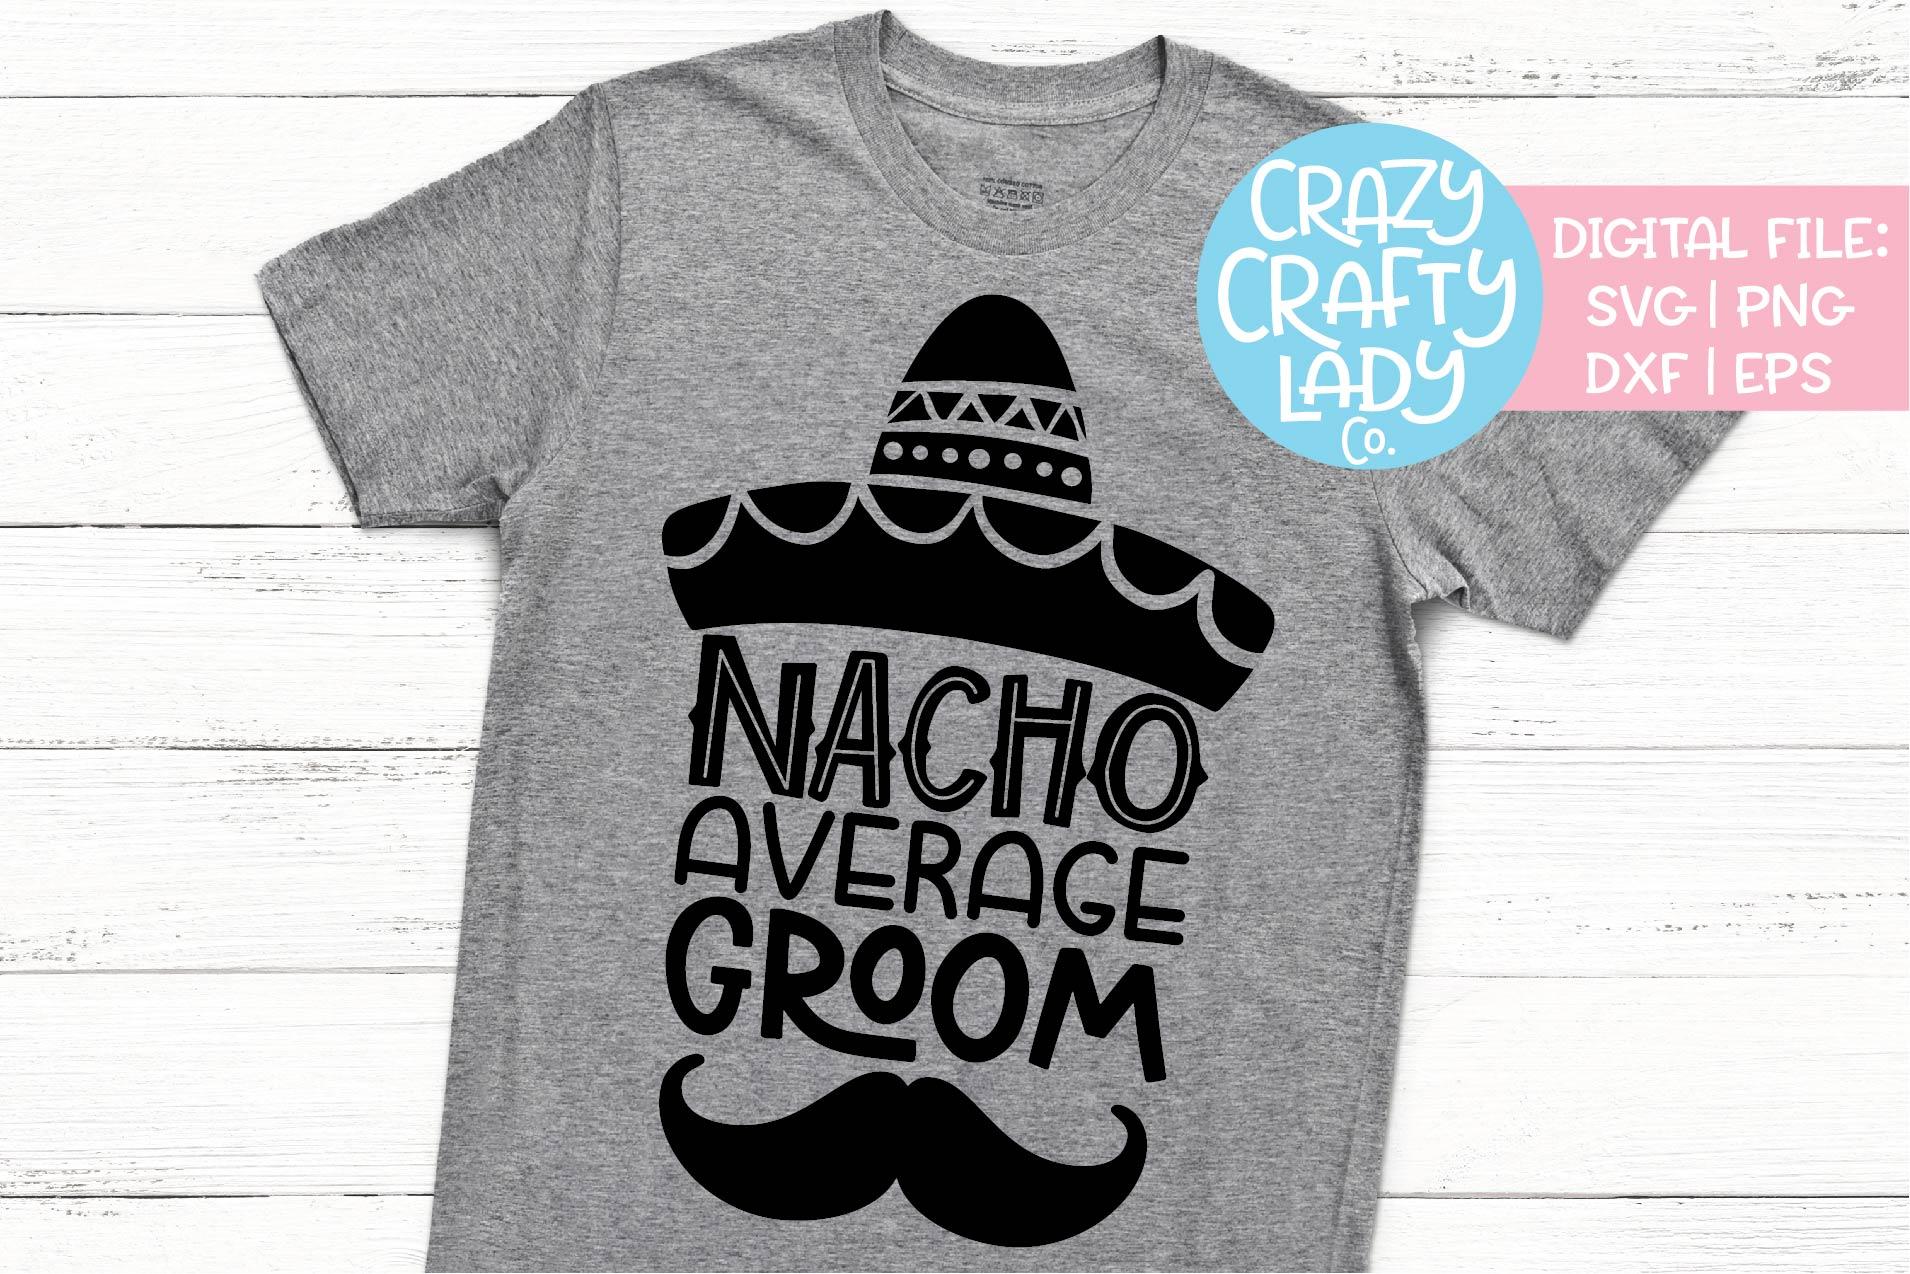 Nacho Average Groom Wedding SVG DXF EPS PNG Cut File example image 1